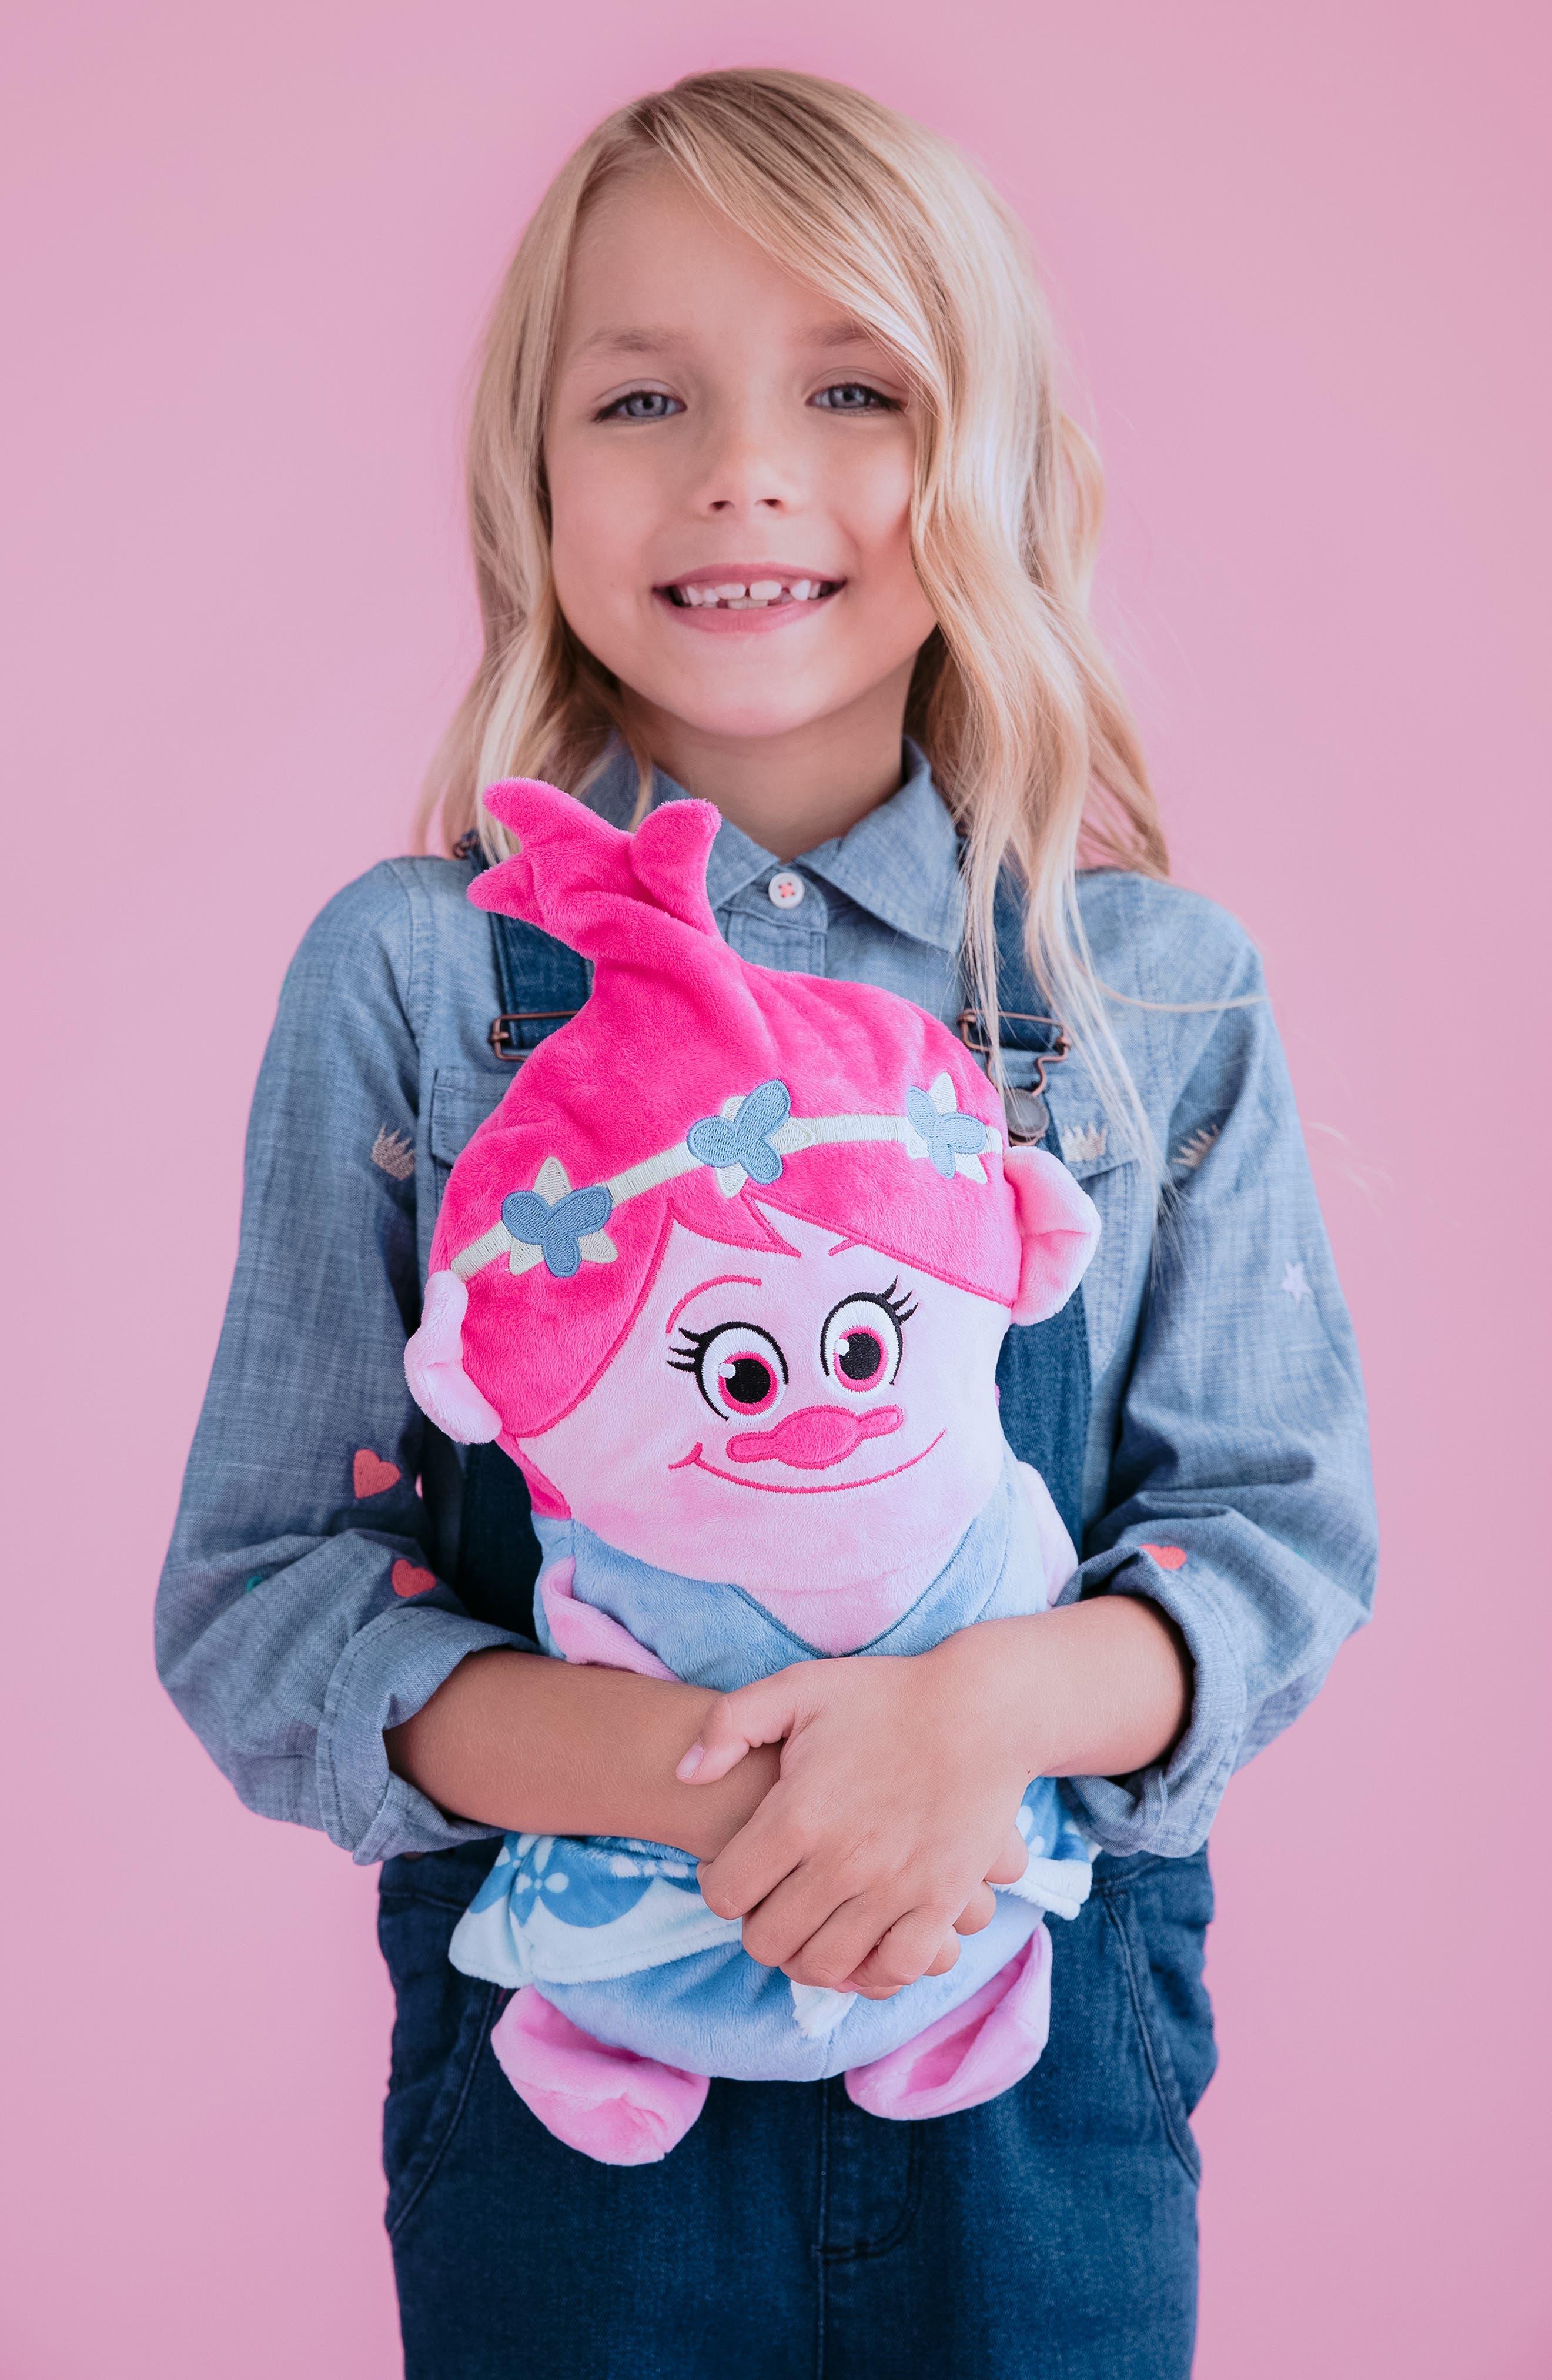 DreamWorks Trolls Poppy 2-in-1 Stuffed Animal Hoodie,                             Alternate thumbnail 9, color,                             PINK MIX